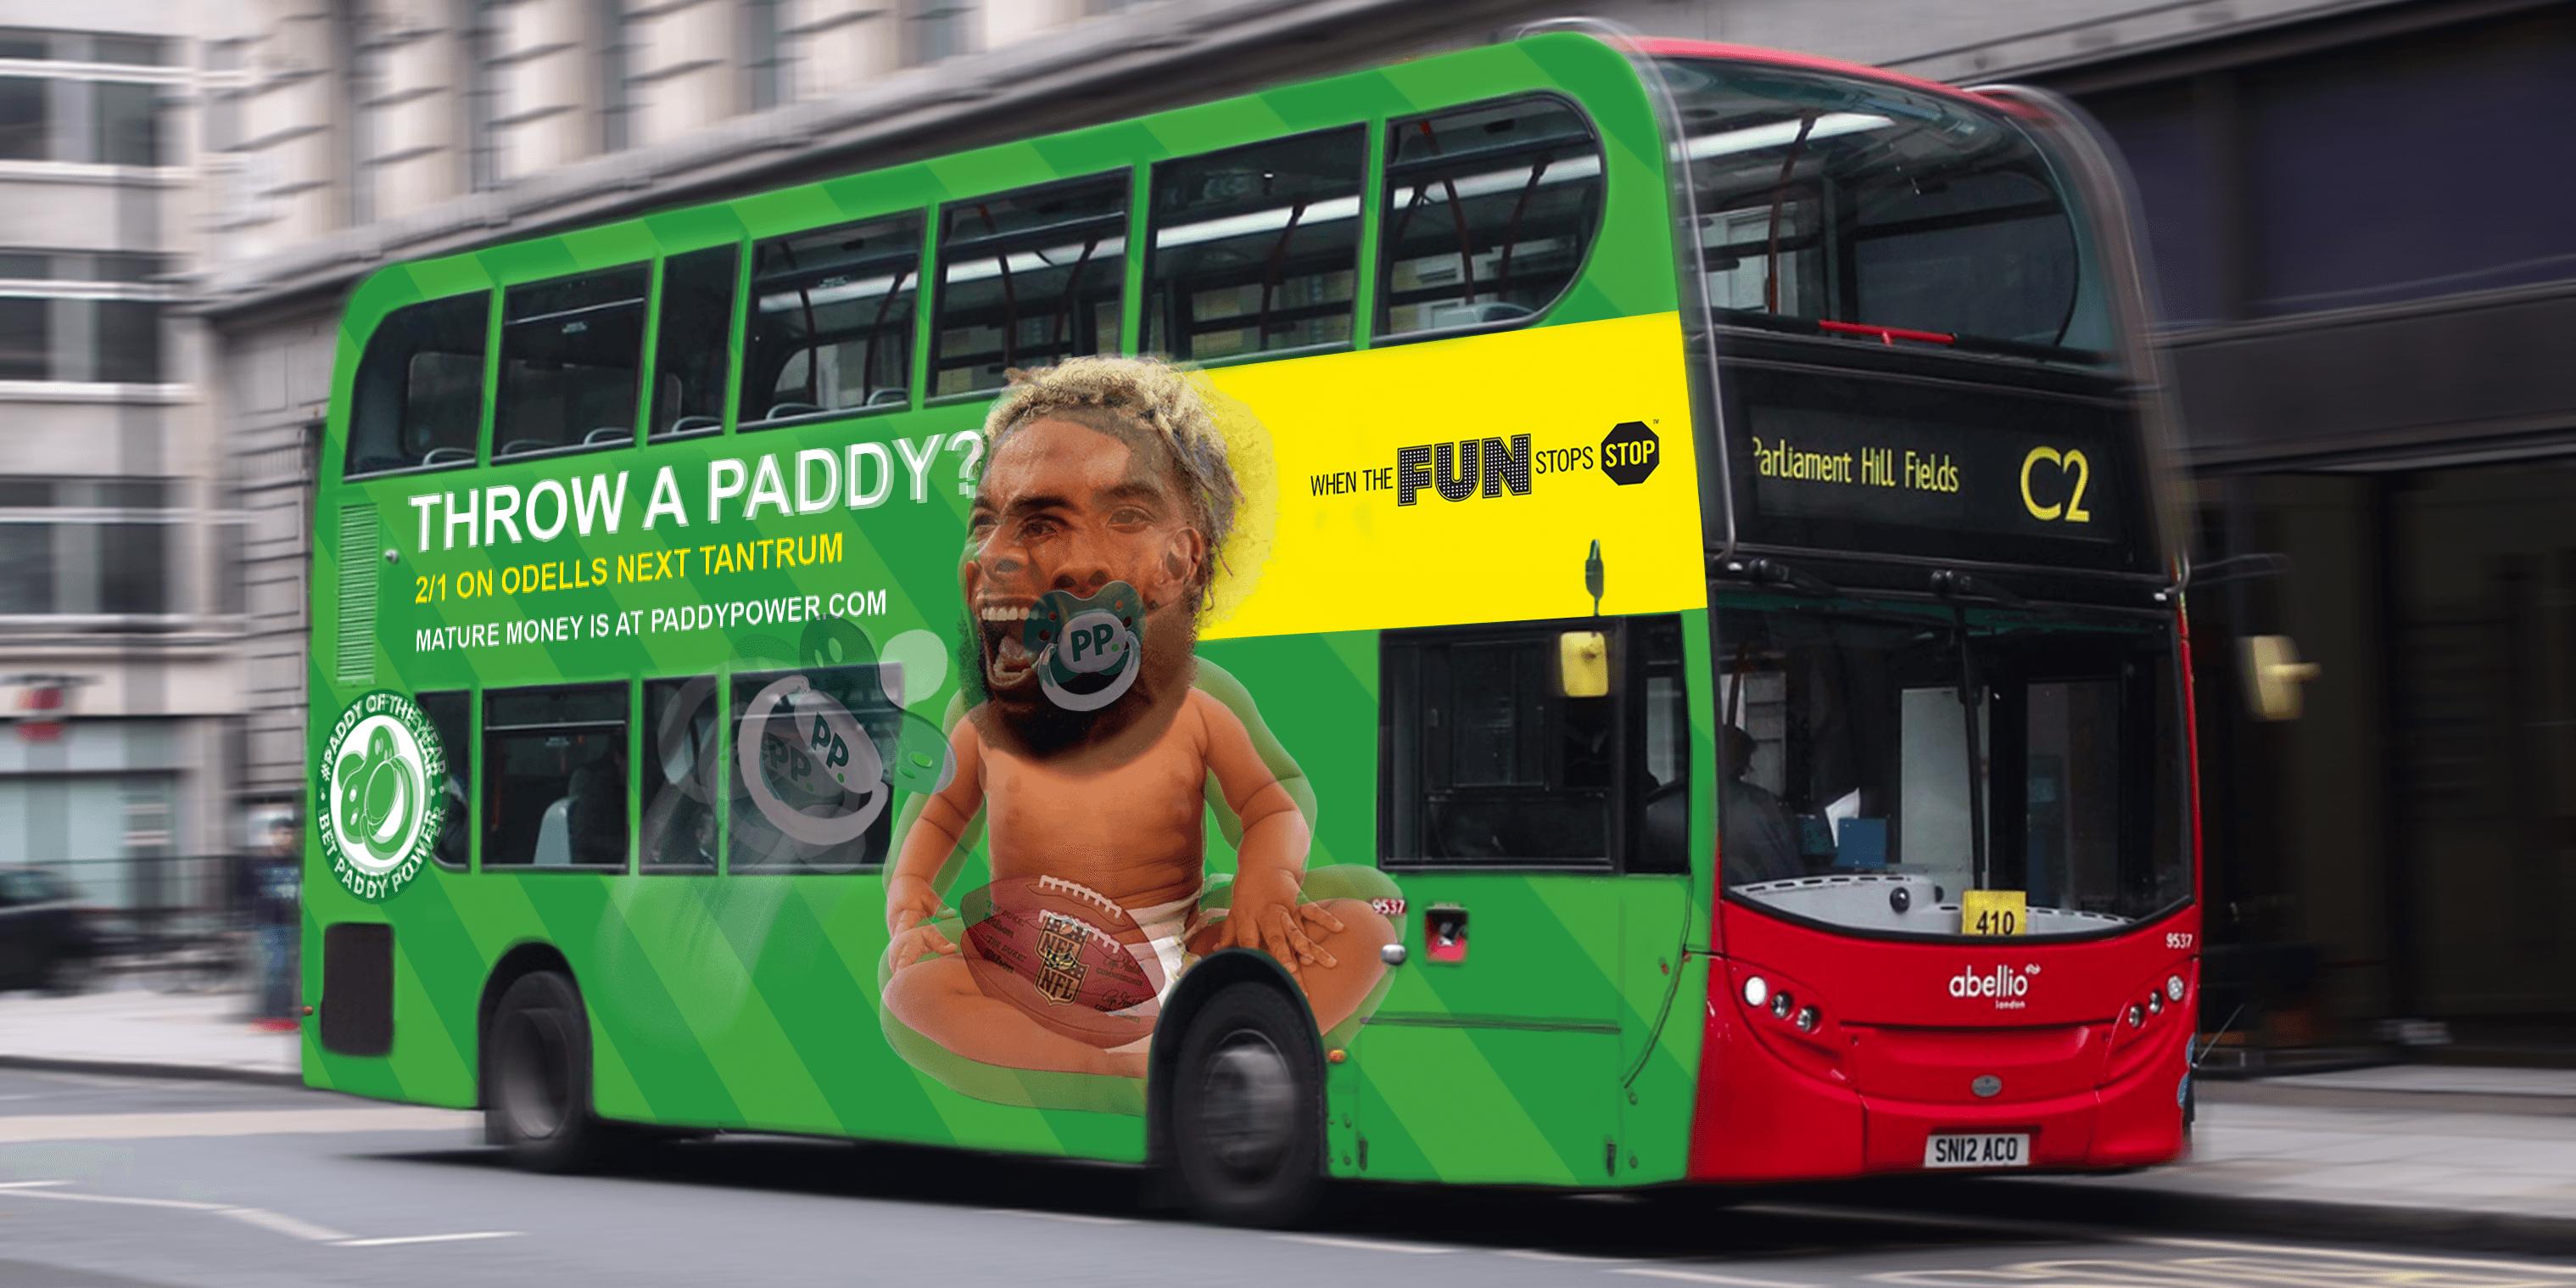 Paddypower Bus Billboard_